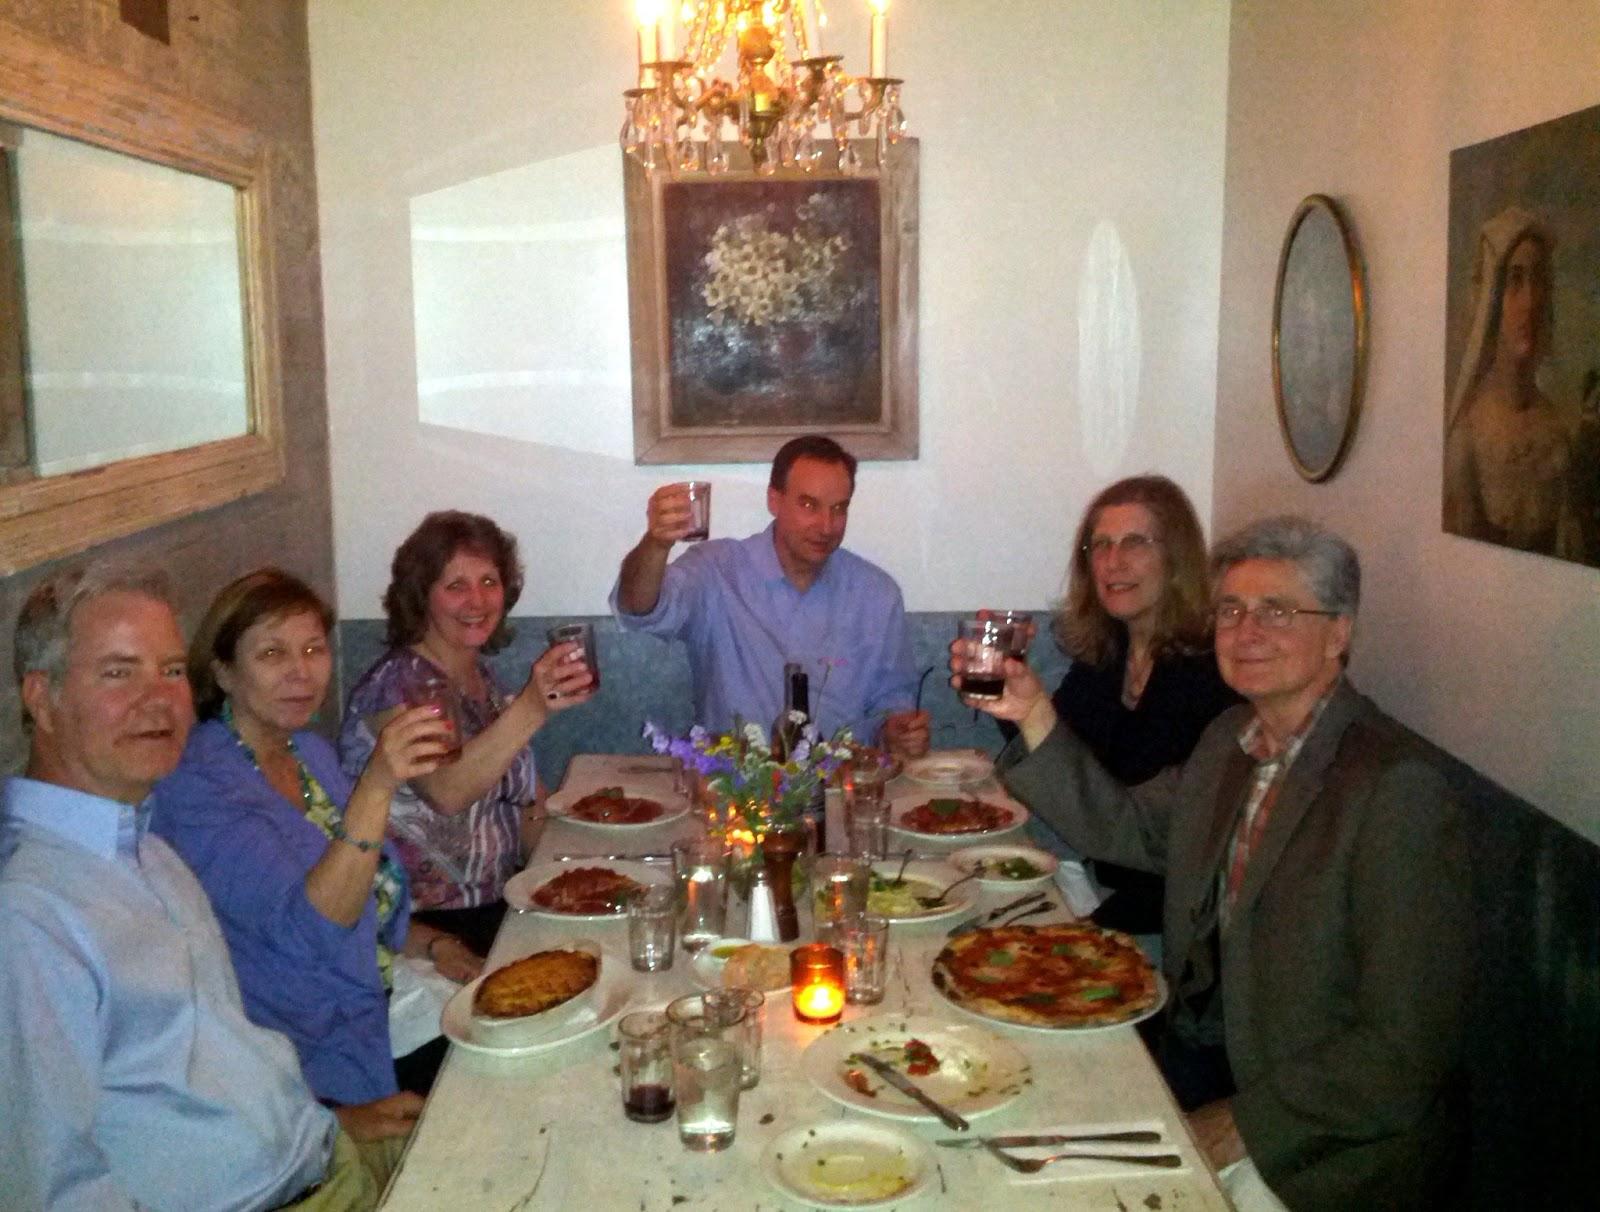 pizza quixote review pane bianco phoenix our private dining alcove